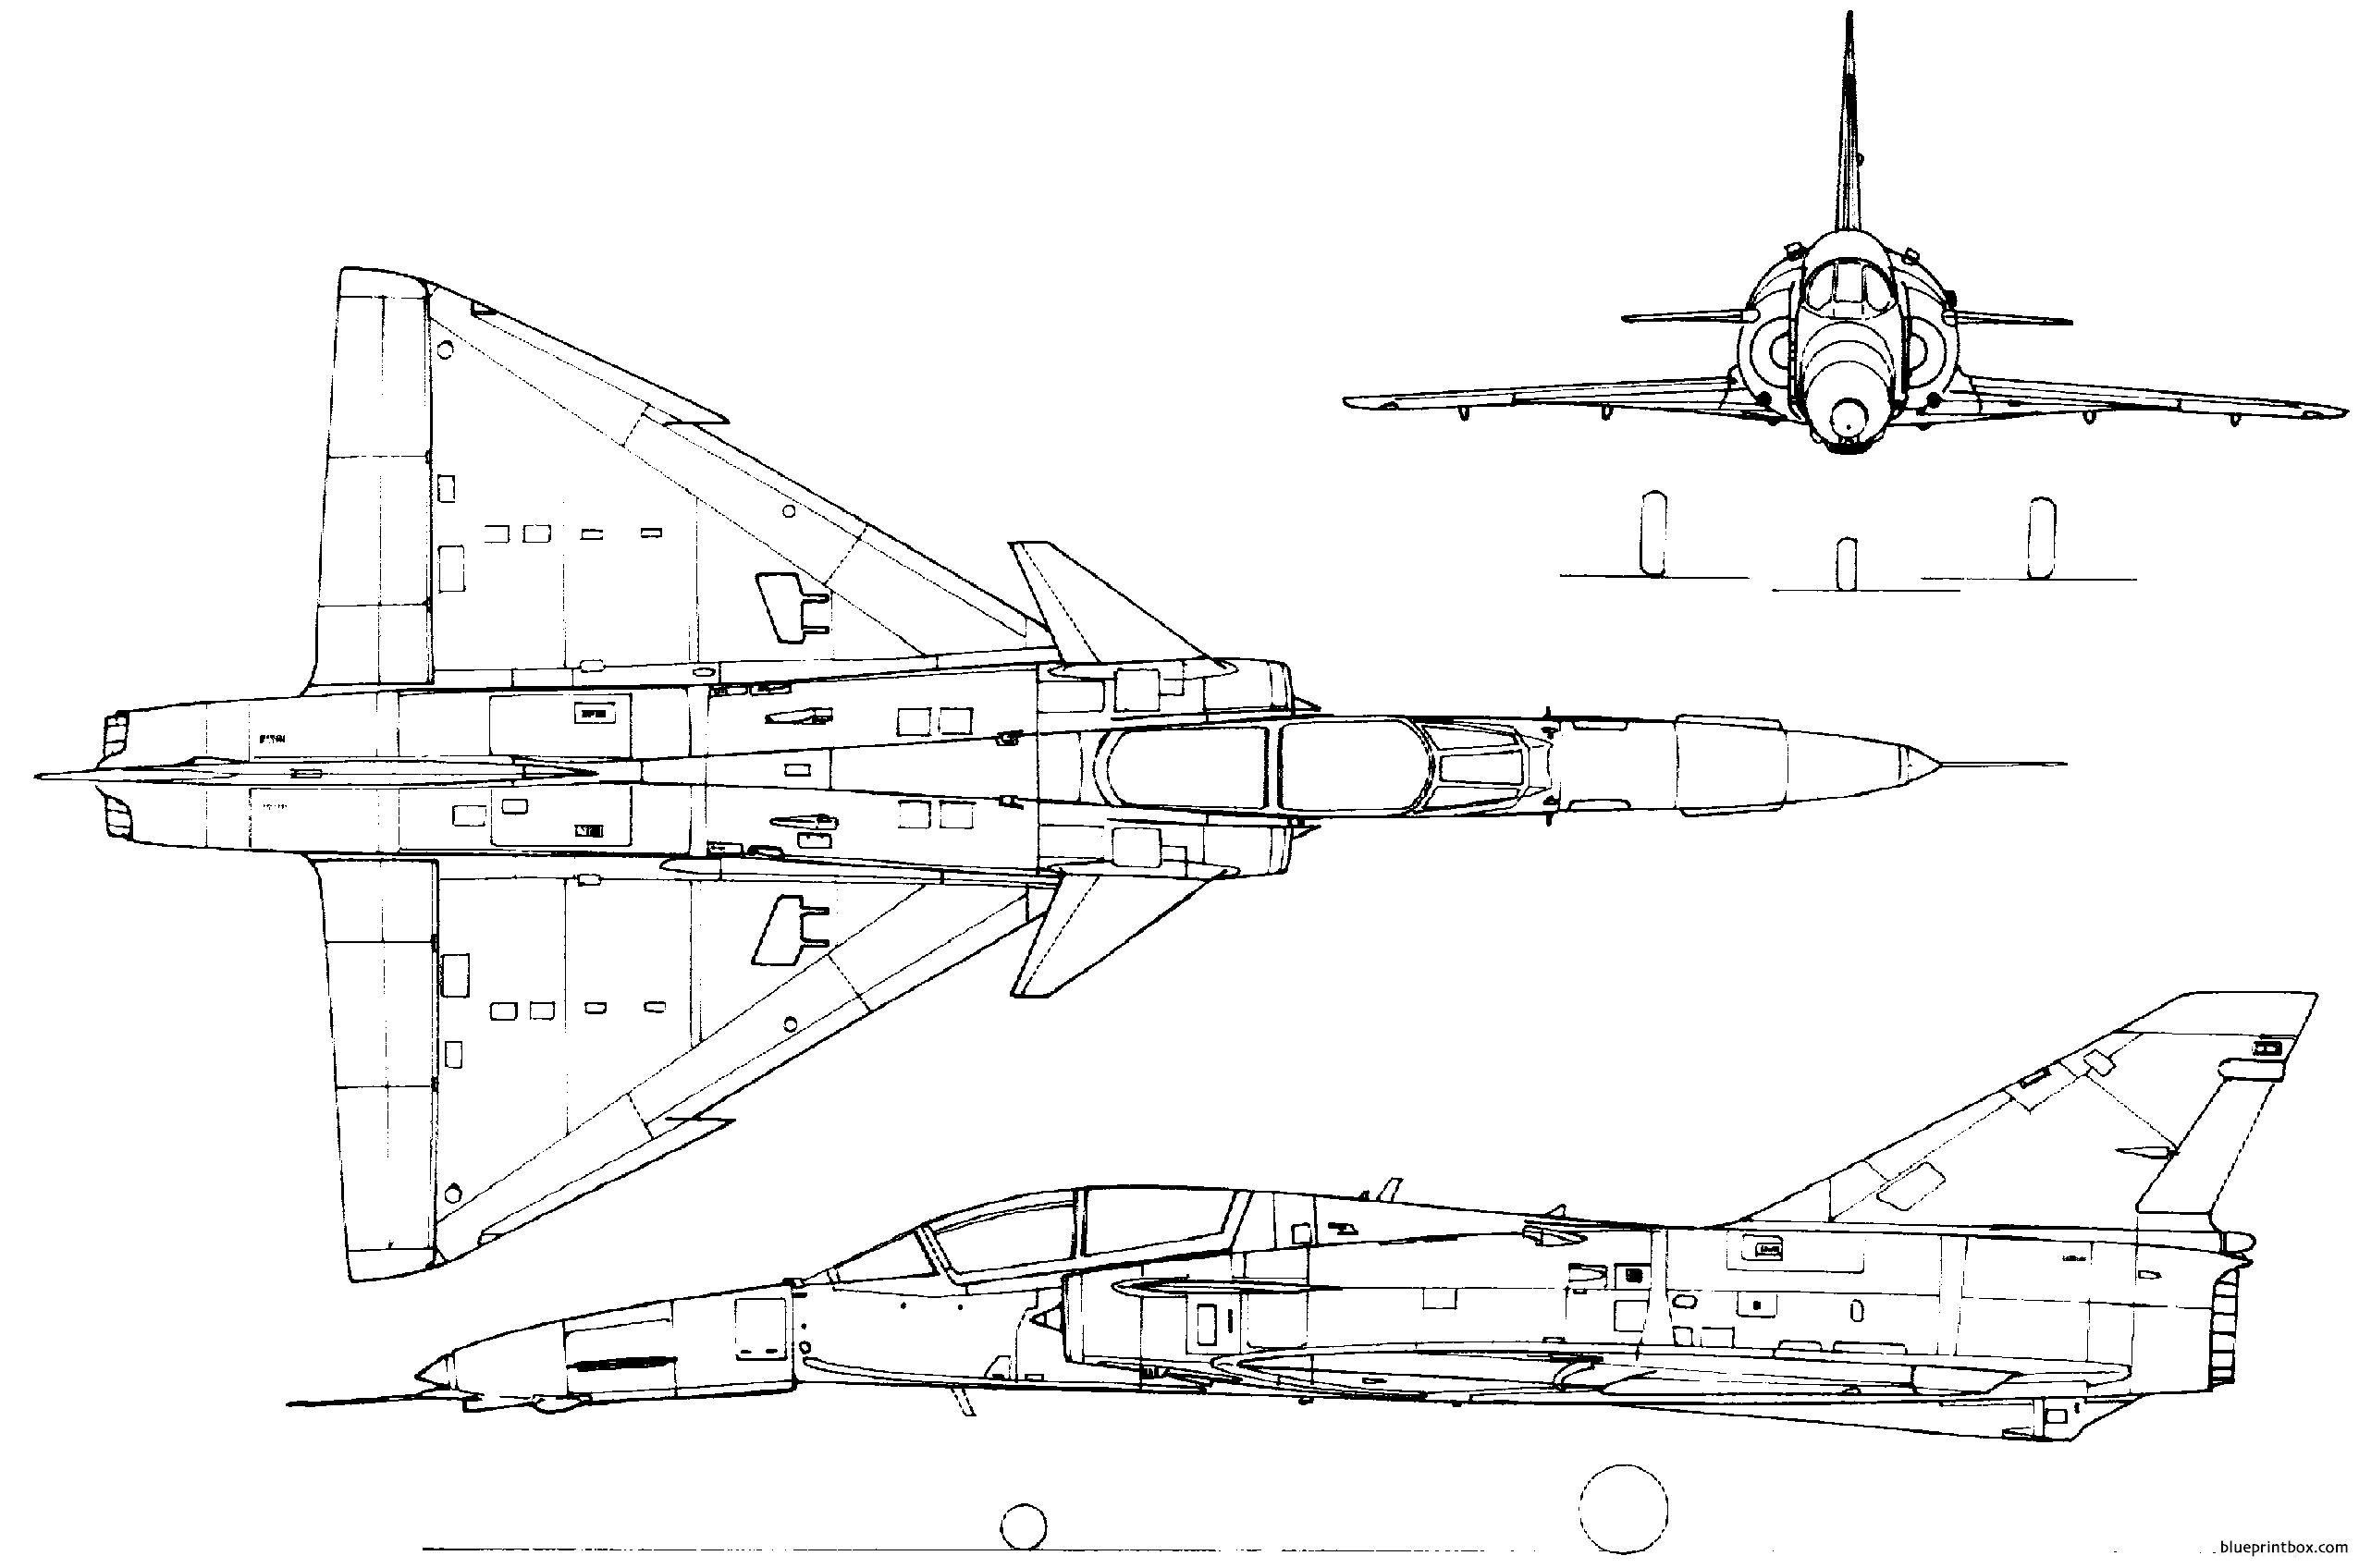 Dassault mirage iii 2 blueprintbox free plans and dassault mirage iii 2 blueprintbox free plans and blueprints of cars malvernweather Images